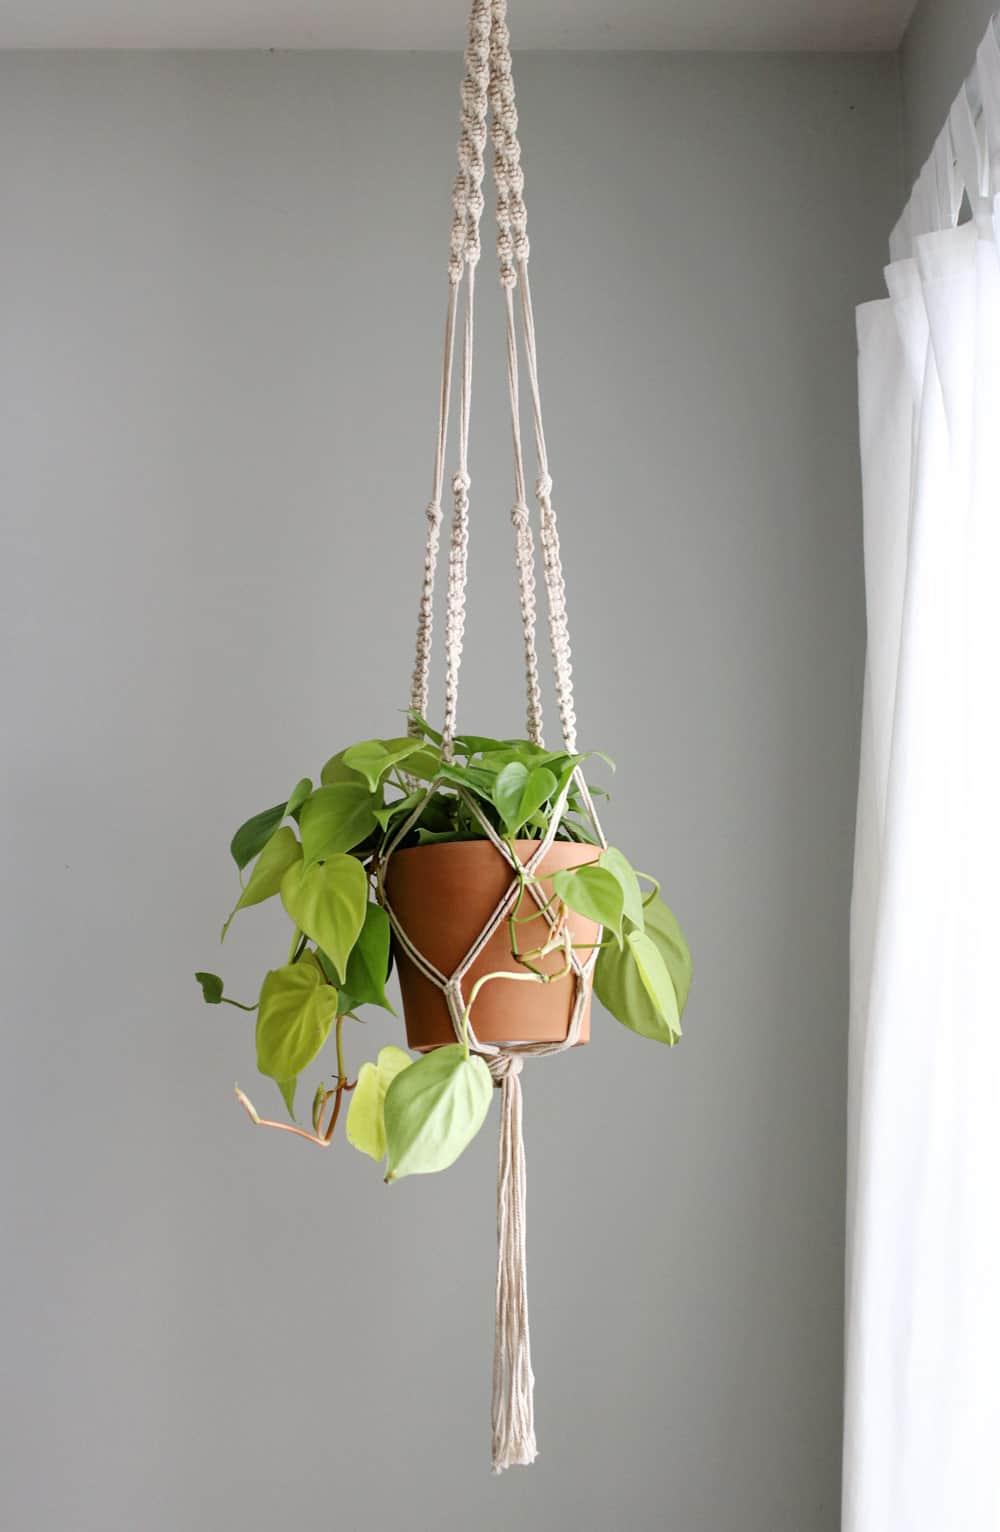 Macrame Plant Hanger - HelloGlow.co